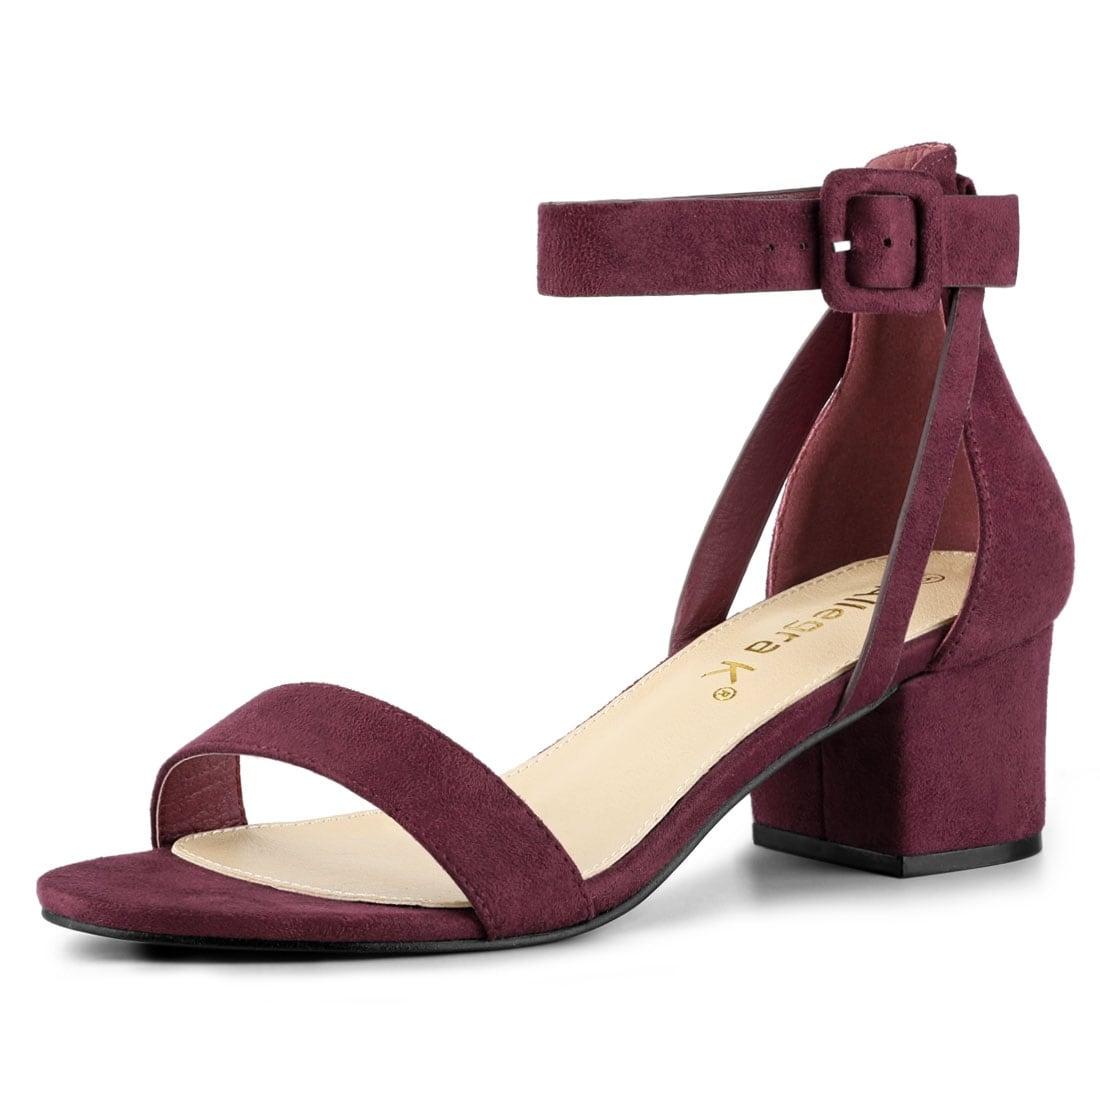 Ankle Strap Block Low Heel Sandals